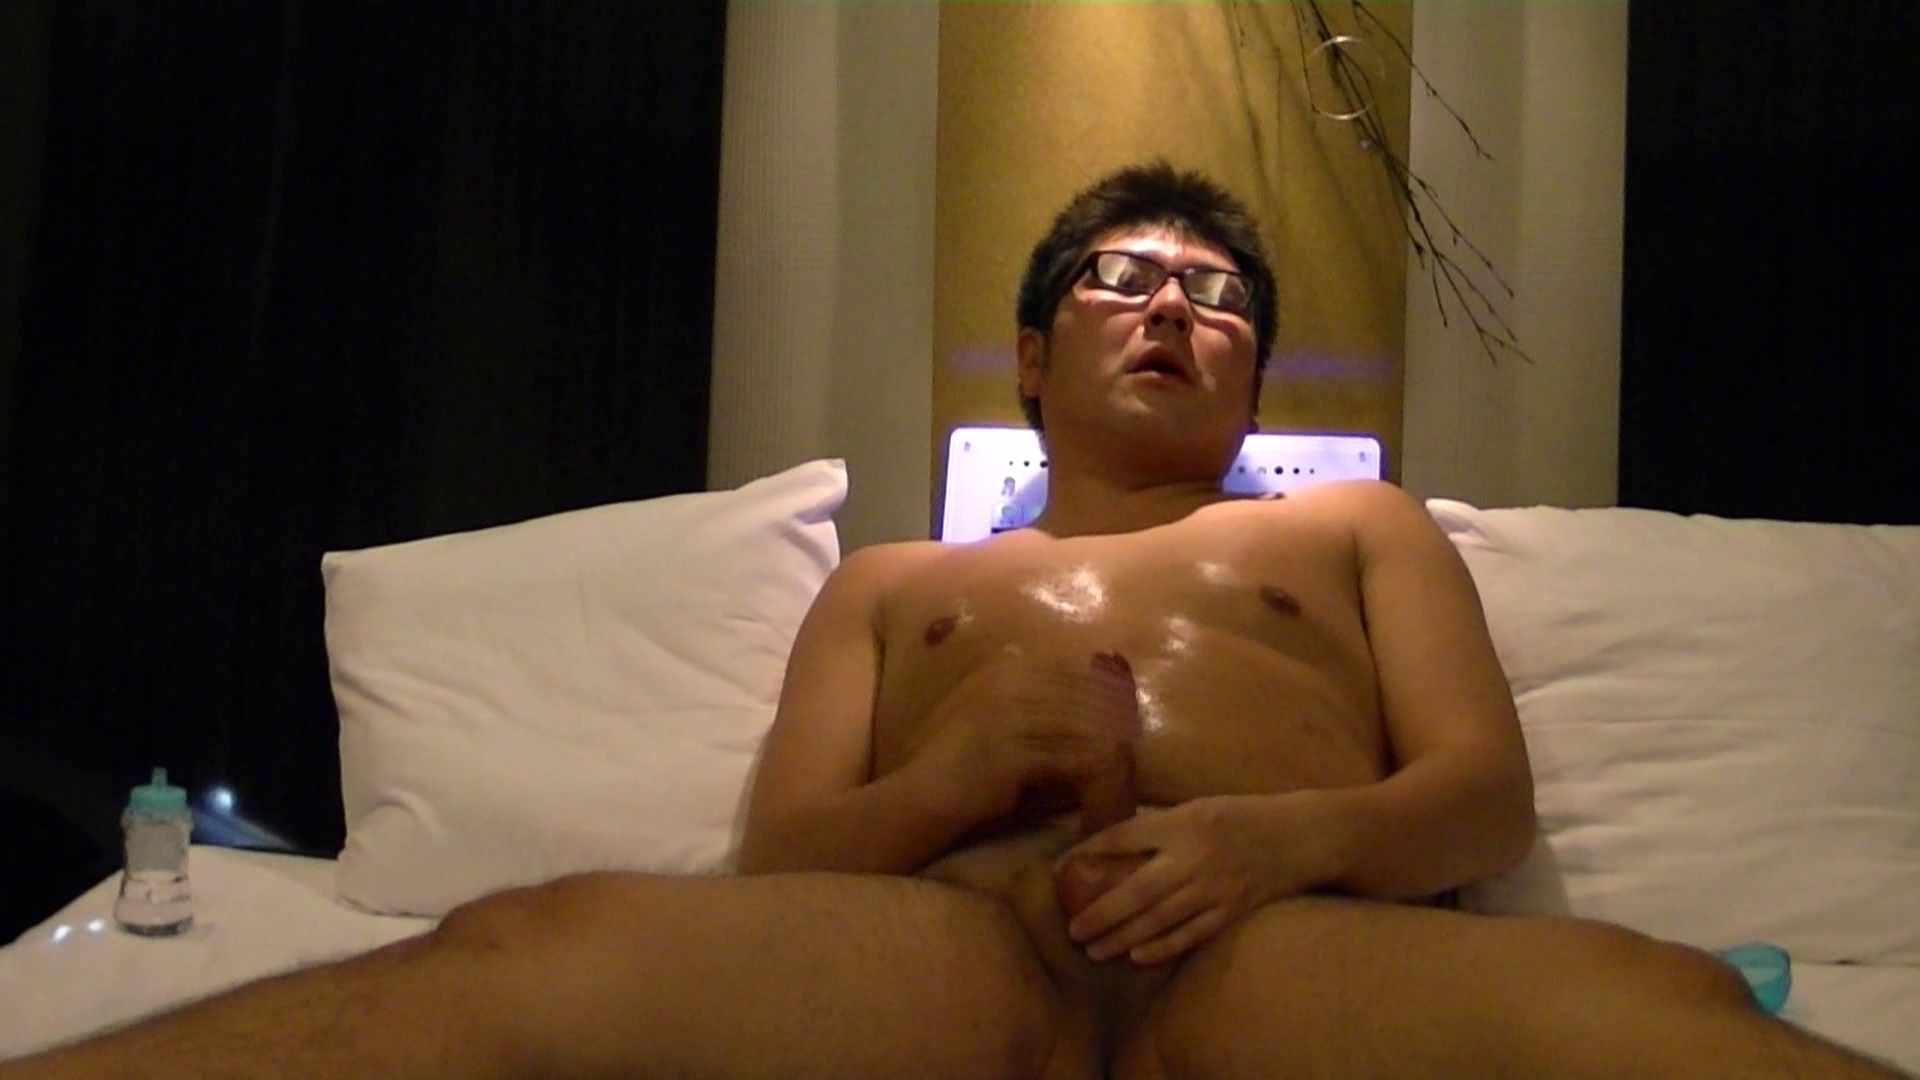 Mr.オナックスさん投稿!HD 貴方のオナニー三万円で撮影させてください。VOL.03 後編 完全無修正でお届け | オナニー特集  83pic 30